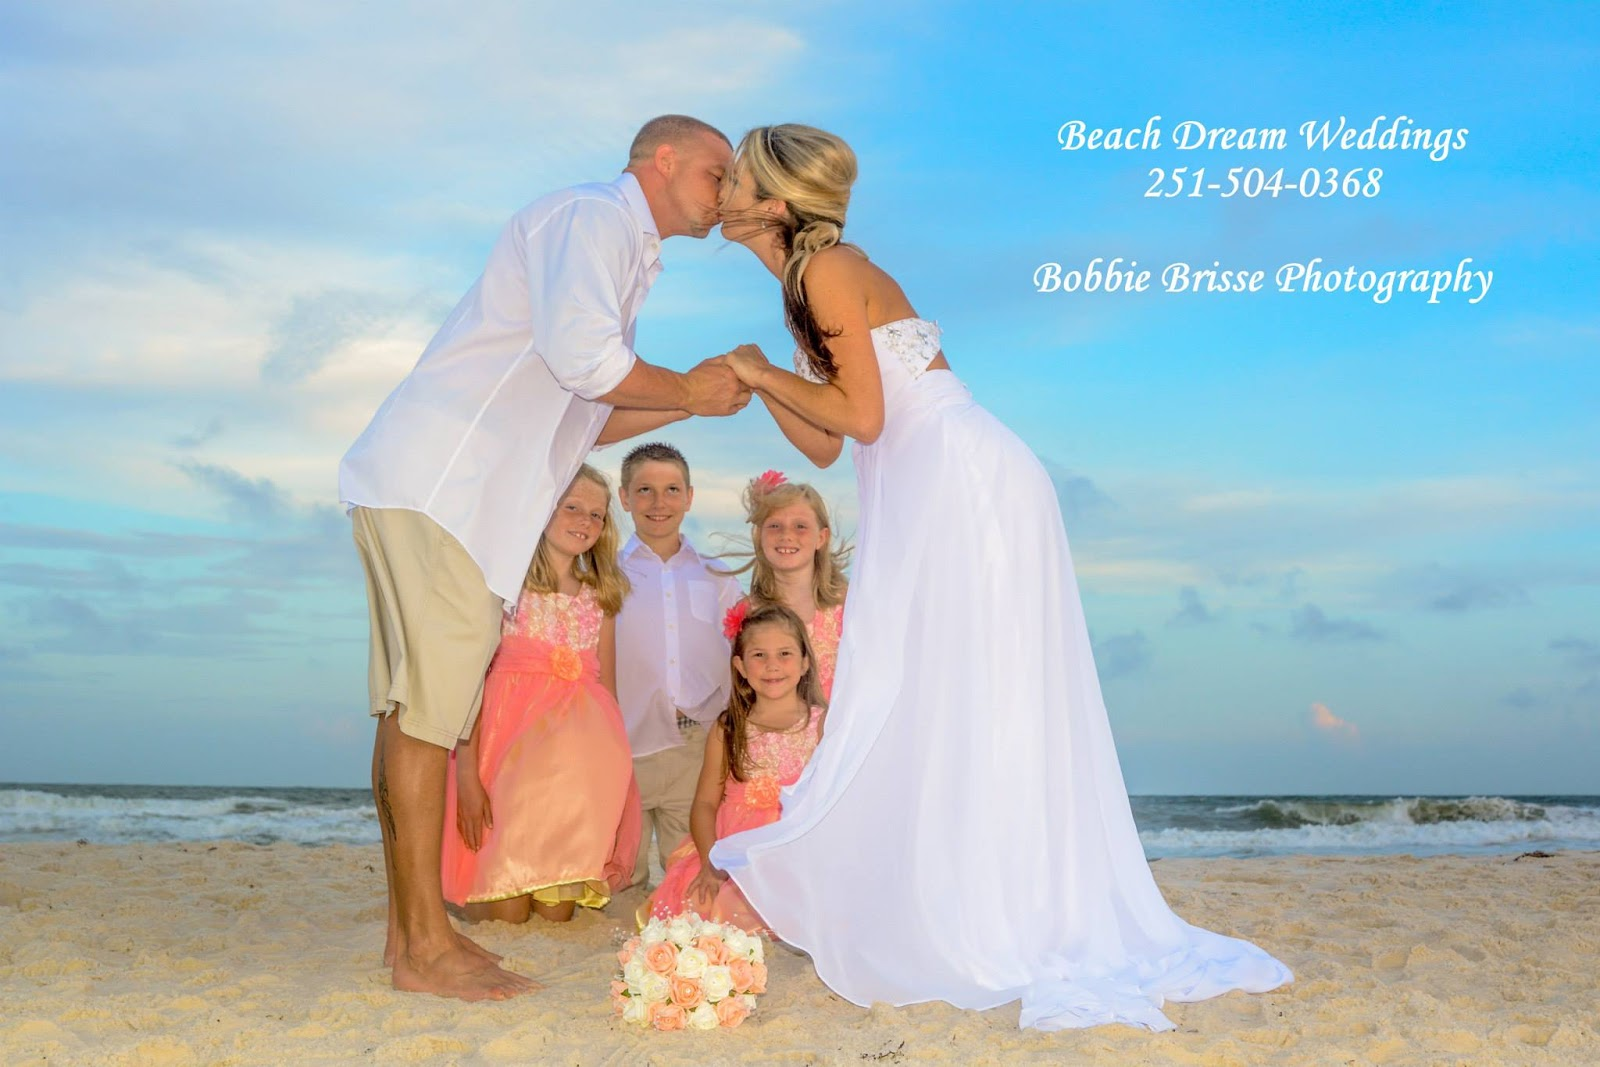 Beach Dream Weddings, LLC - 251.504.0368: Thinking About Eloping ...